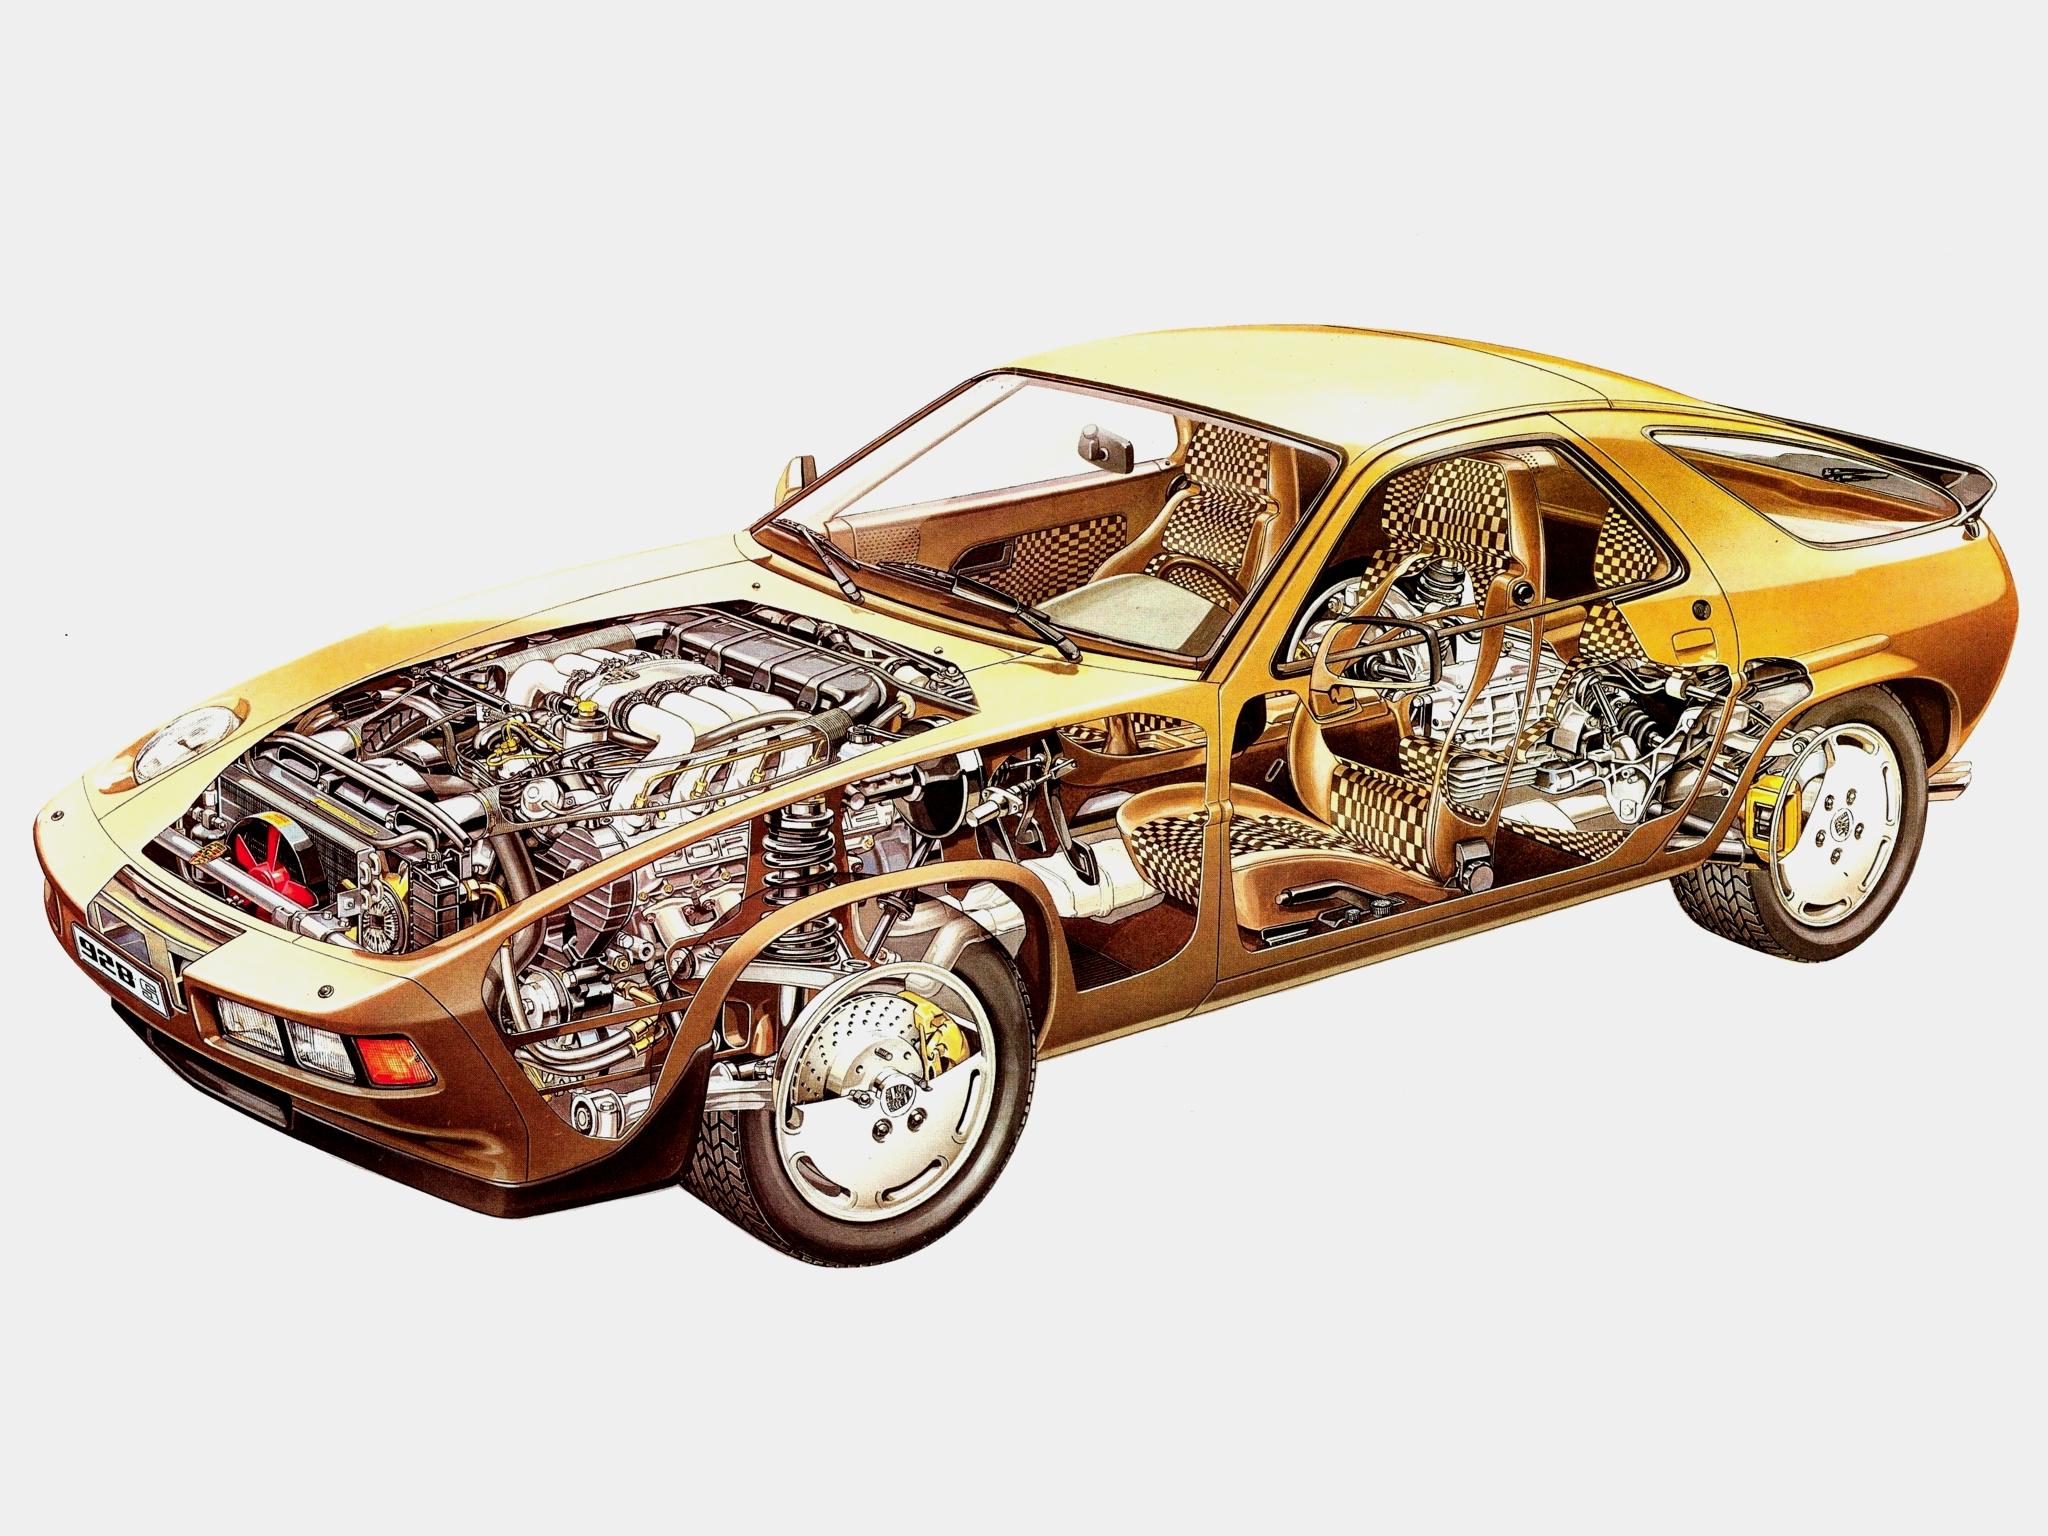 1986 porsche 928 s supercar engine interior i wallpaper 2048x1536 211395 wallpaperup - Porsche engine wallpaper ...